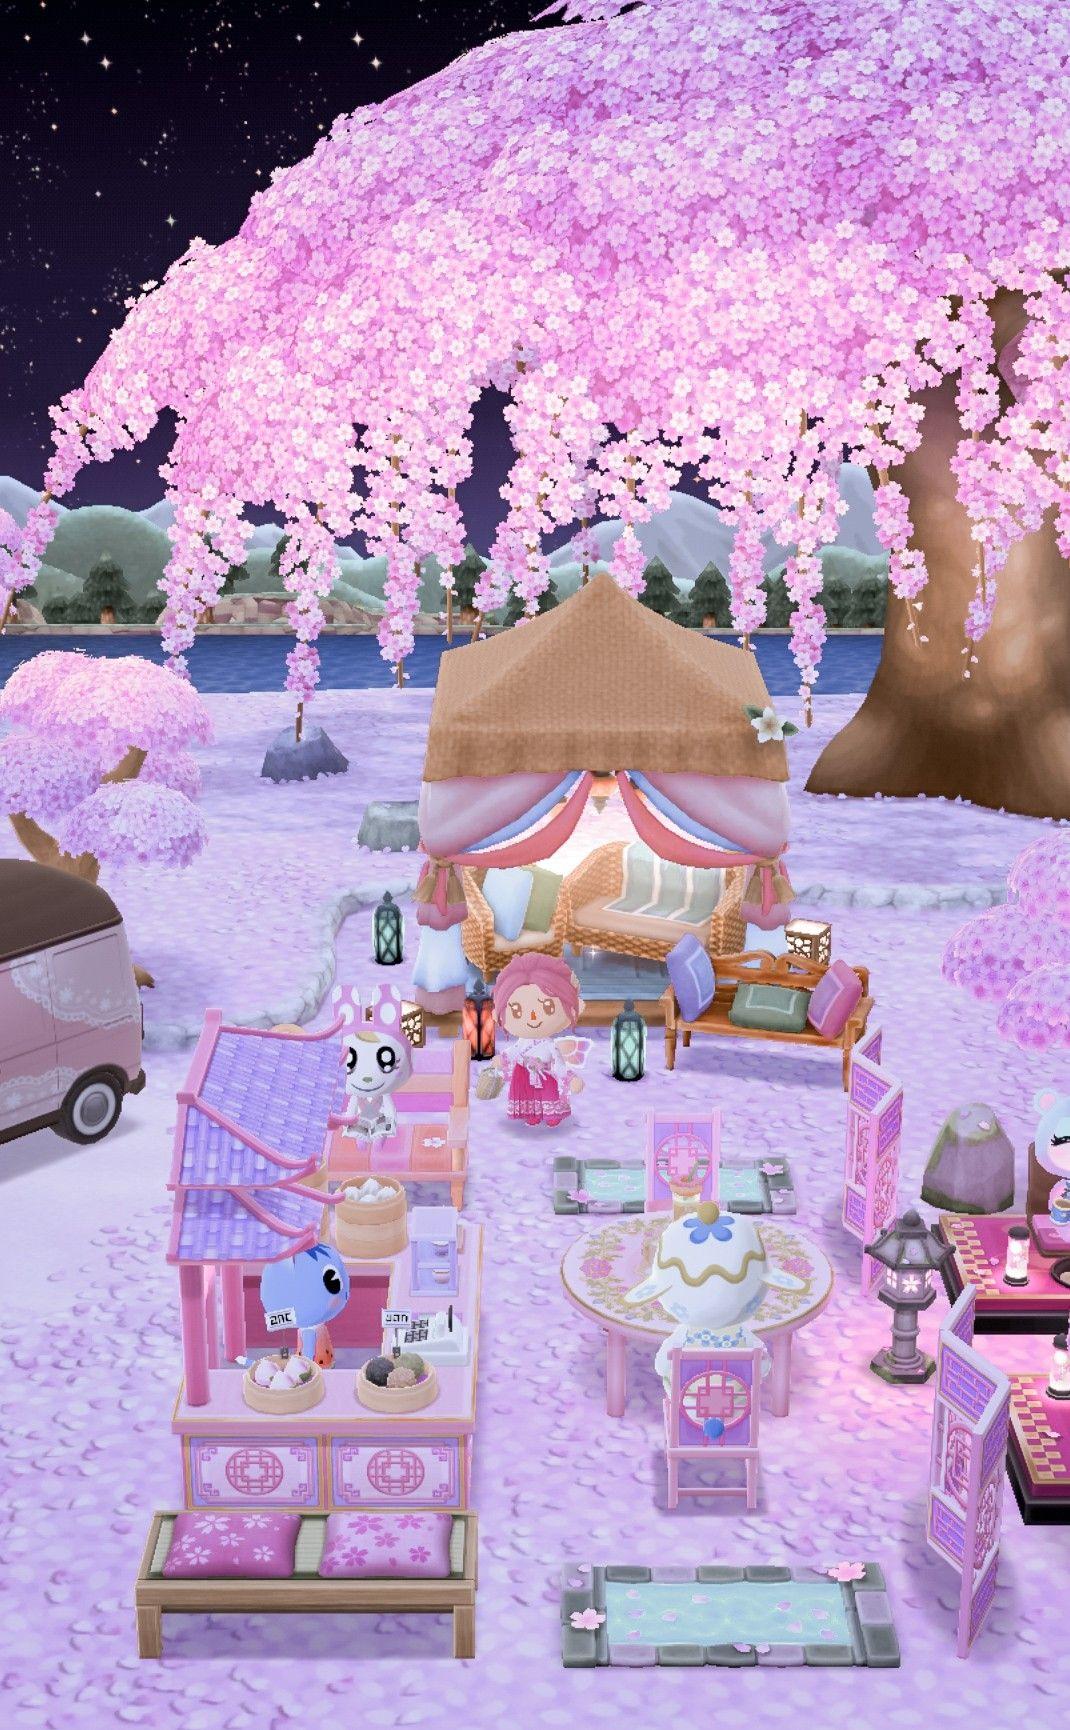 I Love My Pink Campsite Somuchhh Animal Crossing Pc Animal Crossing 3ds Animal Crossing Pocket Camp